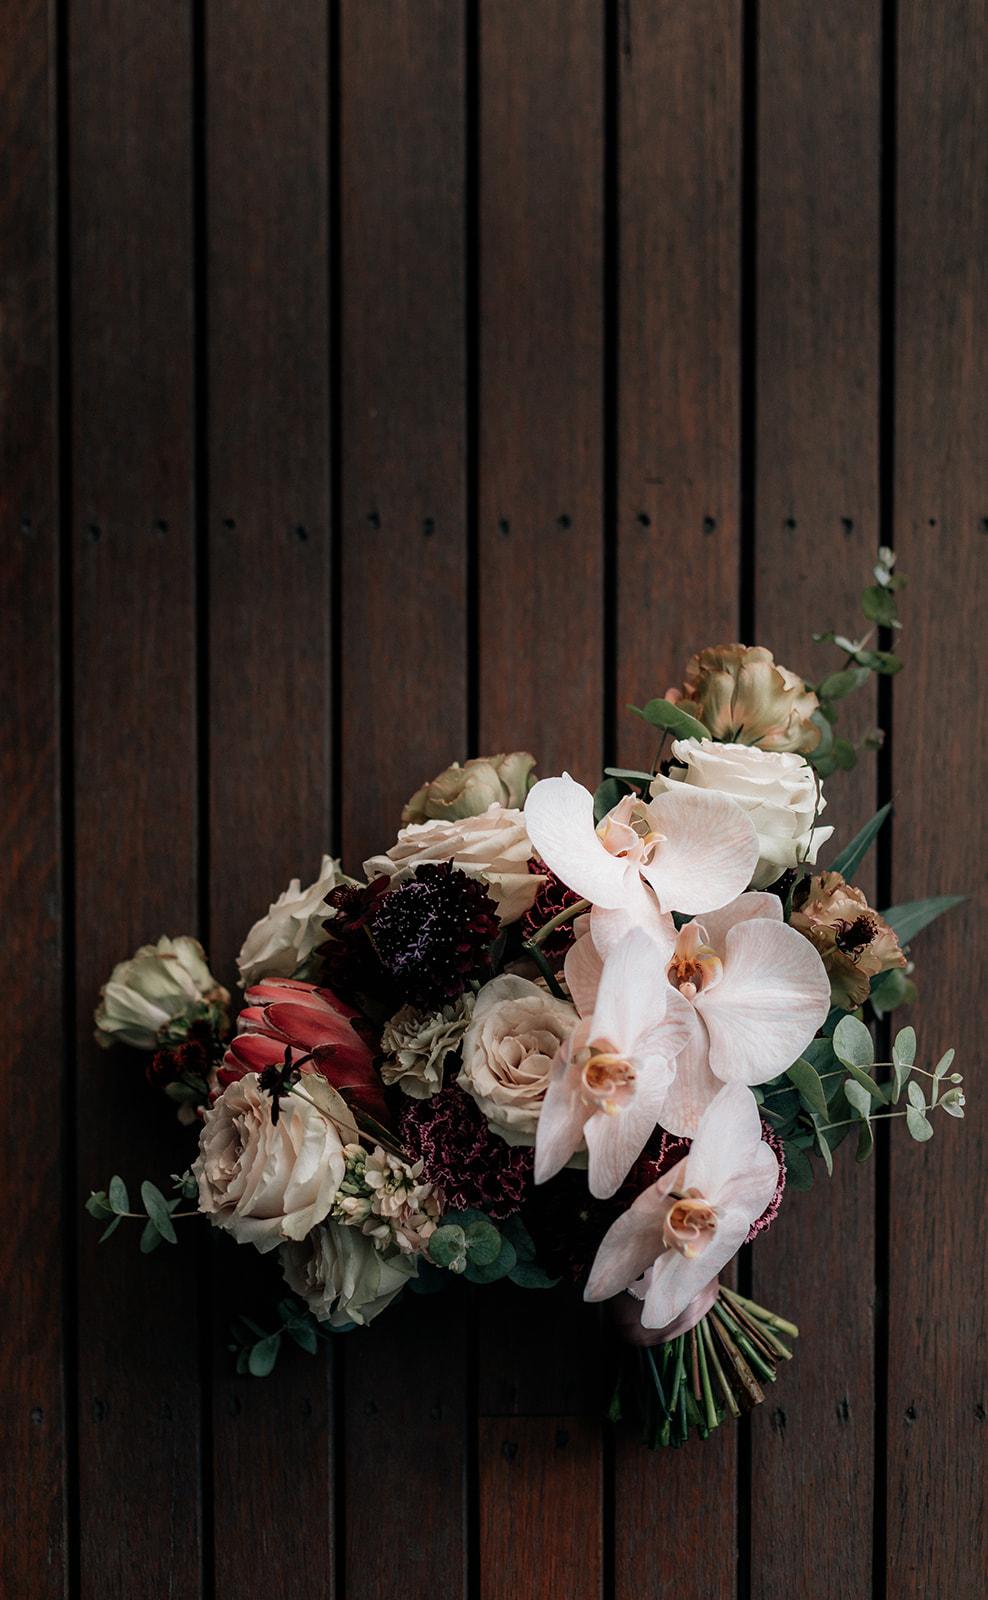 Karis and Oli_Sydney Wedding_Bradleys Head_Holly Medway Photography-19.jpg